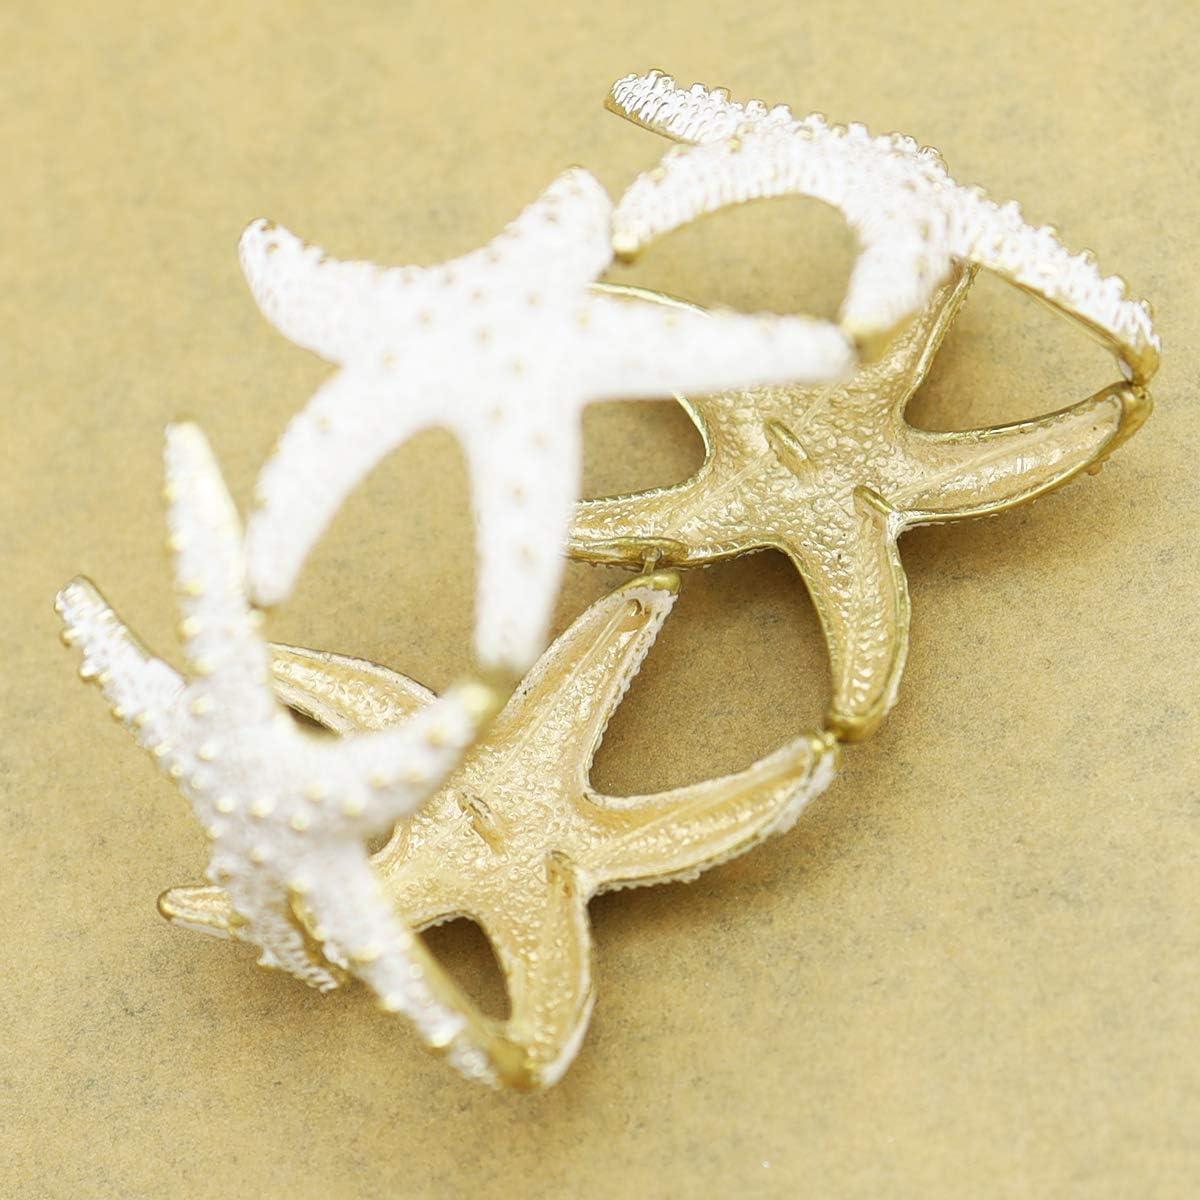 RechicGu Gold Cuff Bracelet Bangle Fro Women Starfish Halloween Christmas Textured Beach Sea Enamel Stretch